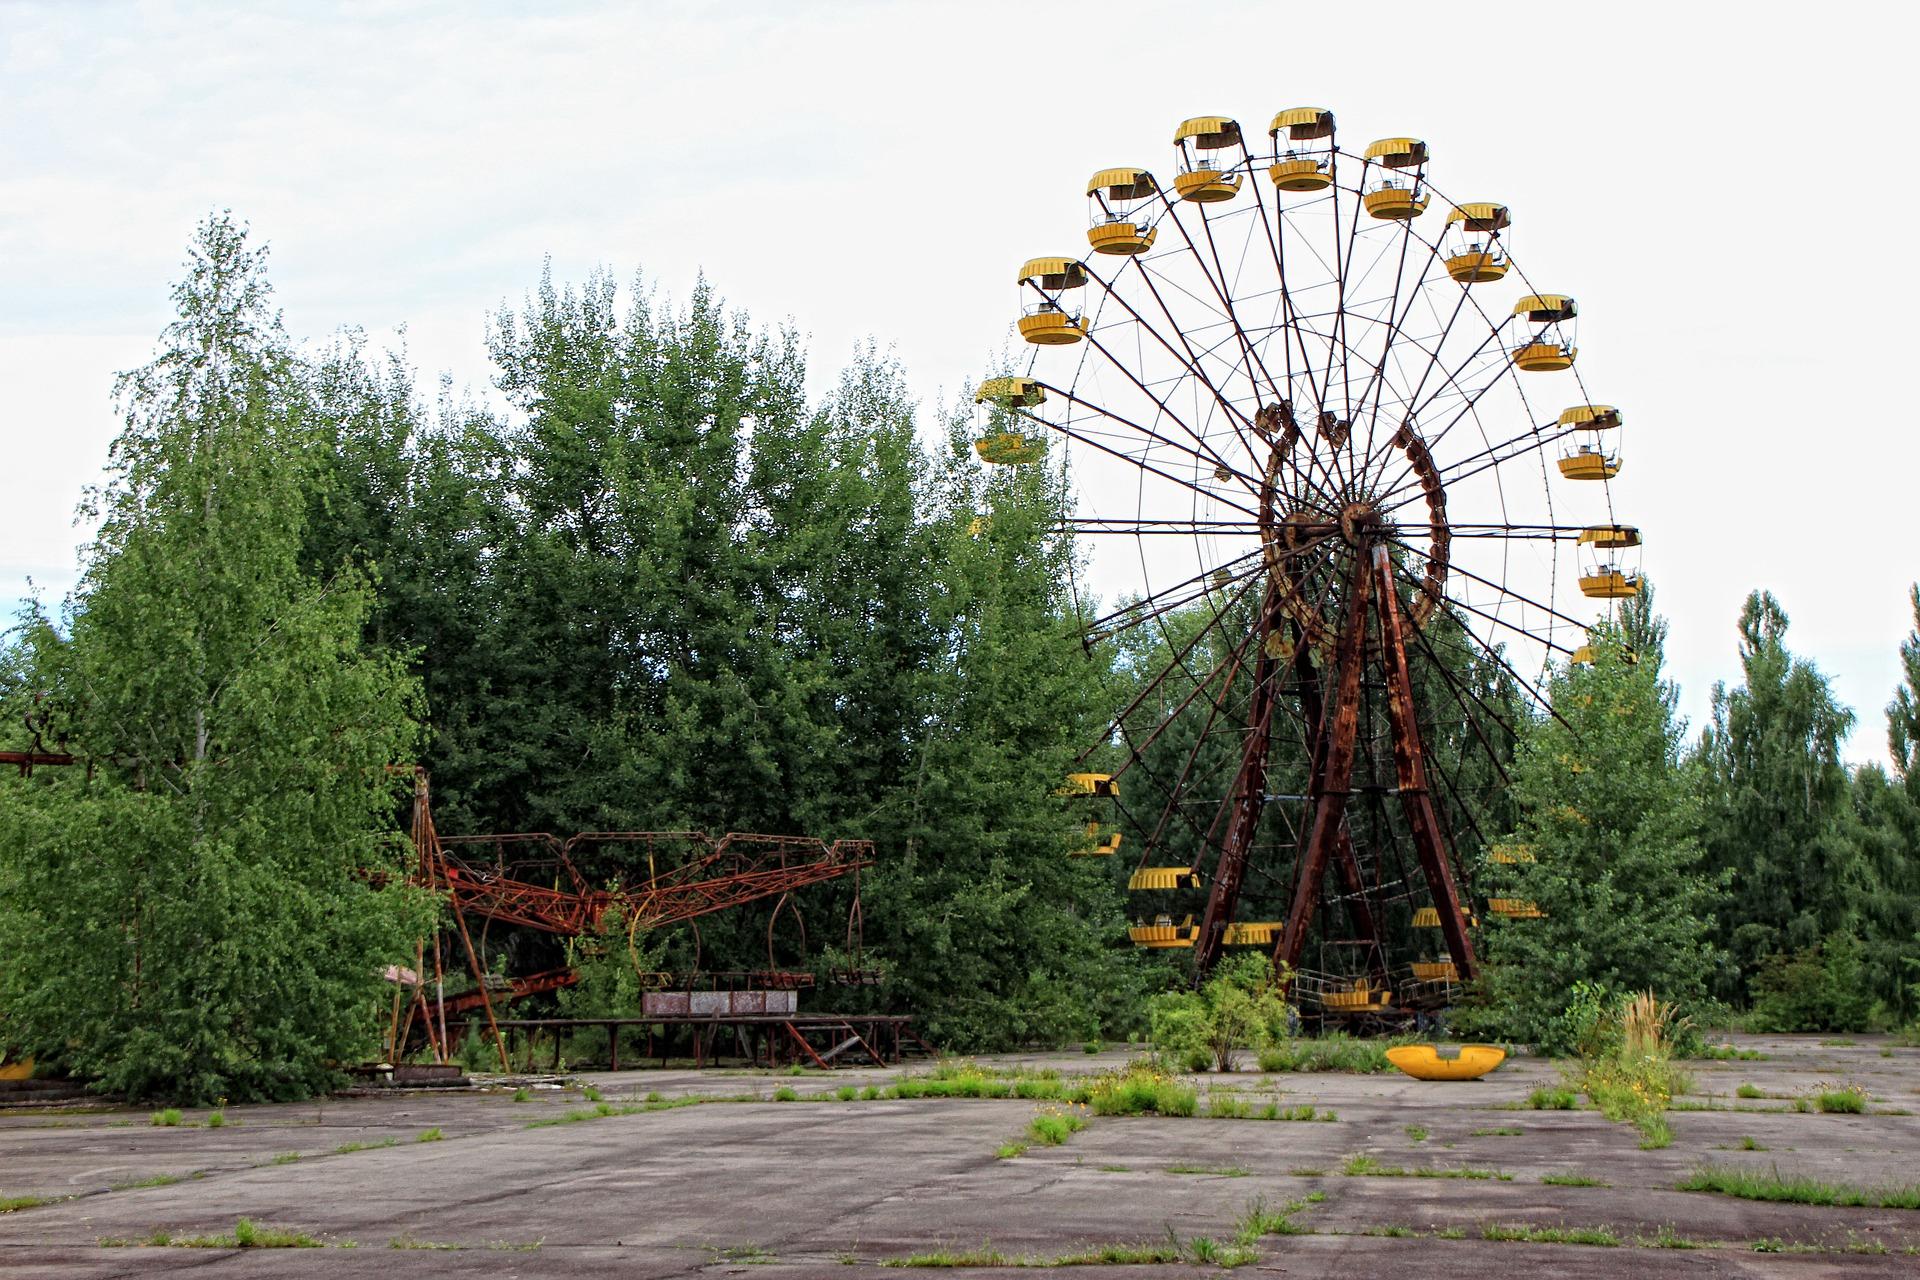 Uninhabitable for humans, but an amusement park for wildlife.